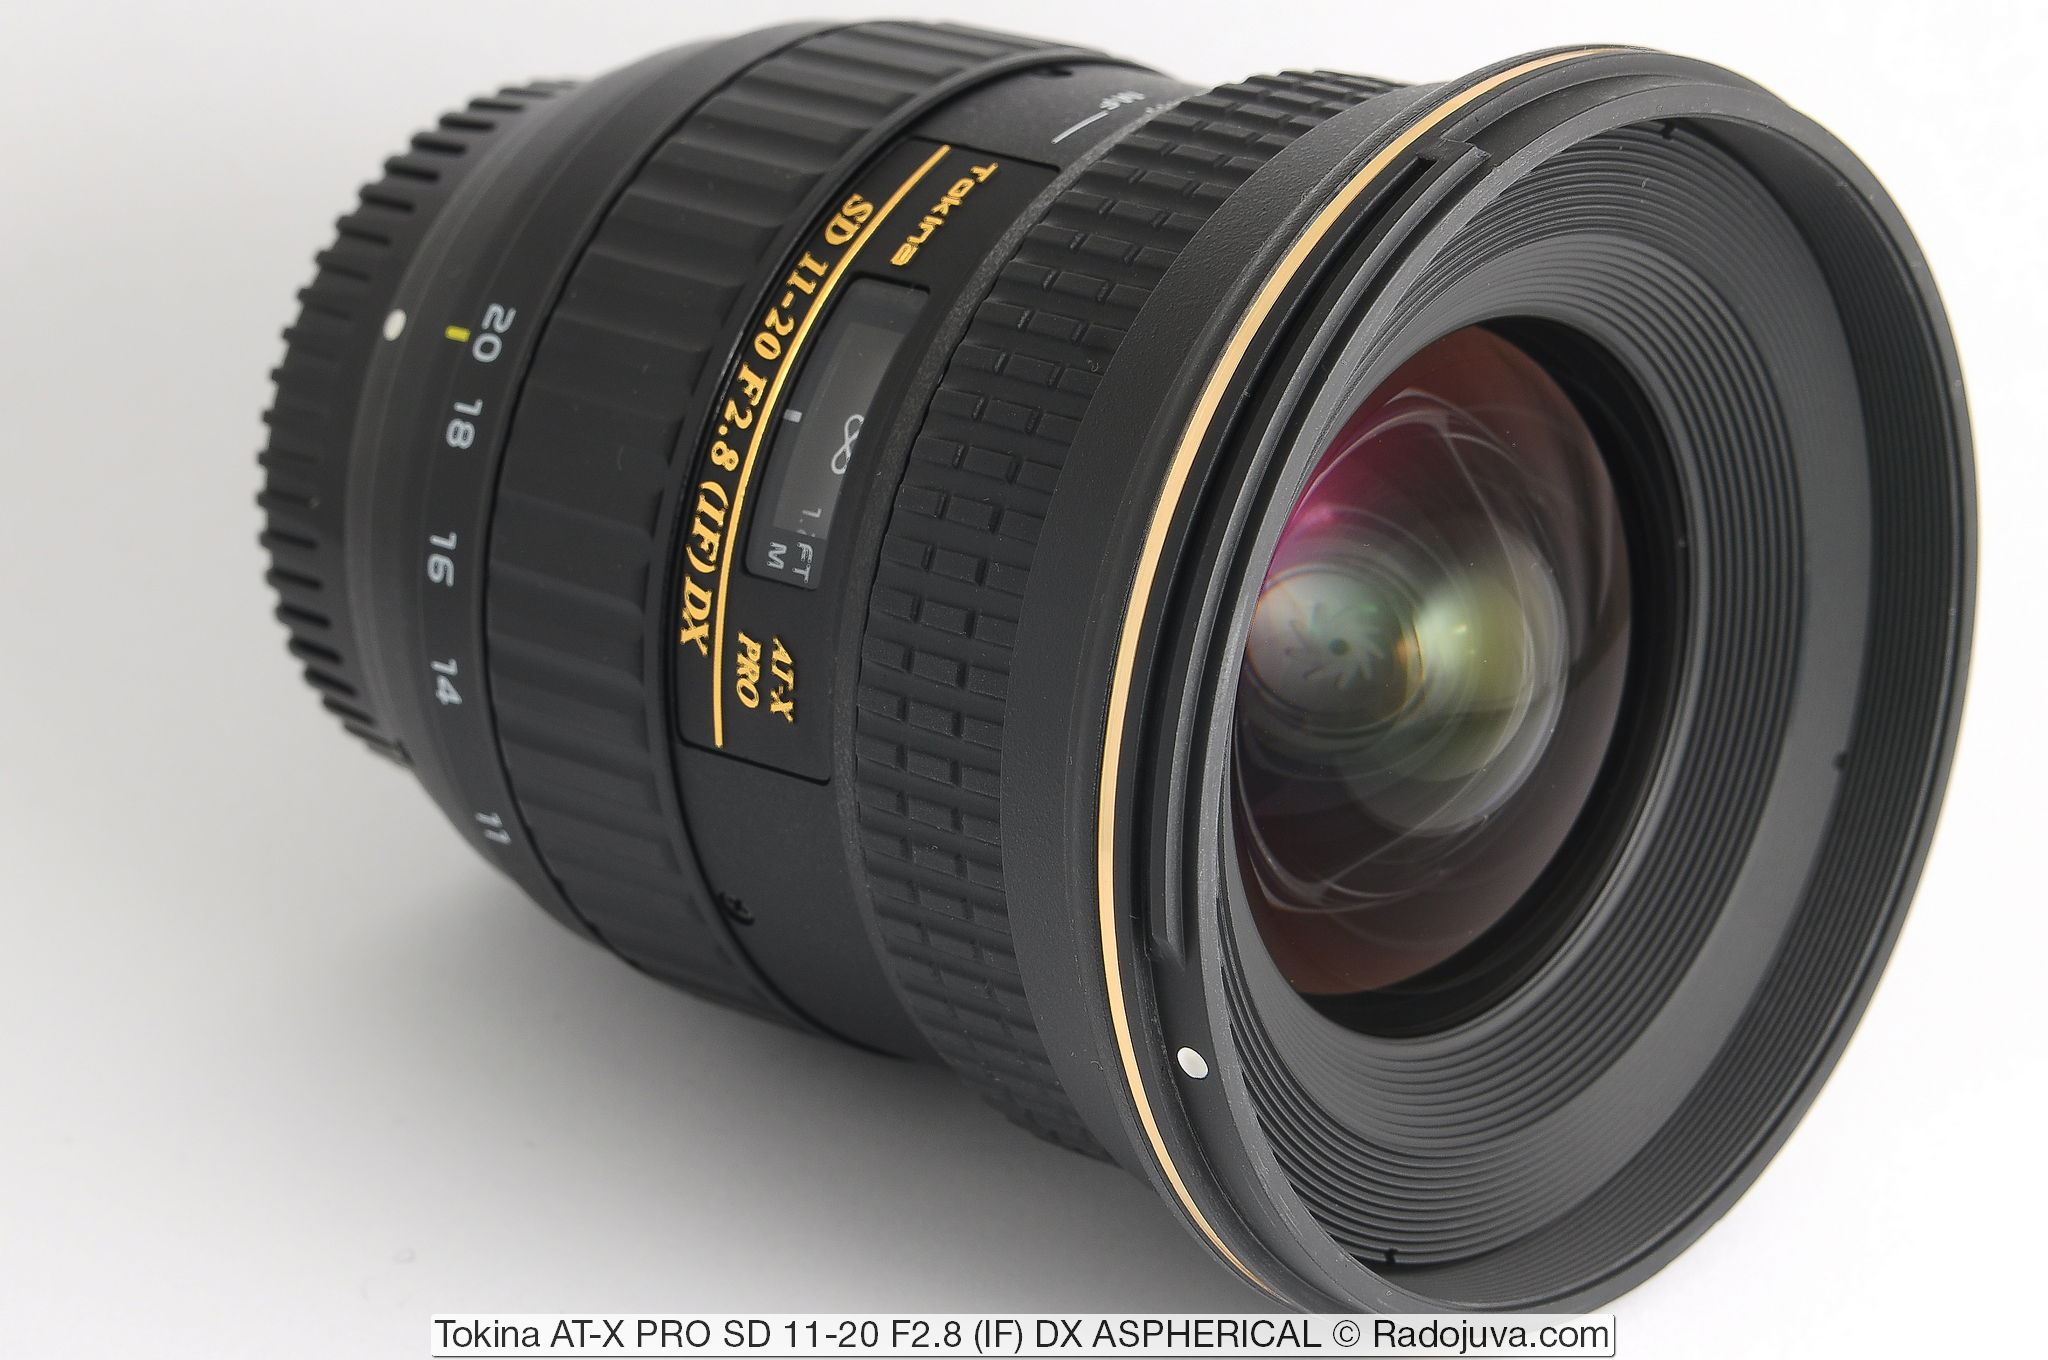 Tokina AT-X PRO SD 11-20 F2.8 (IF) DX ASPHERICAL